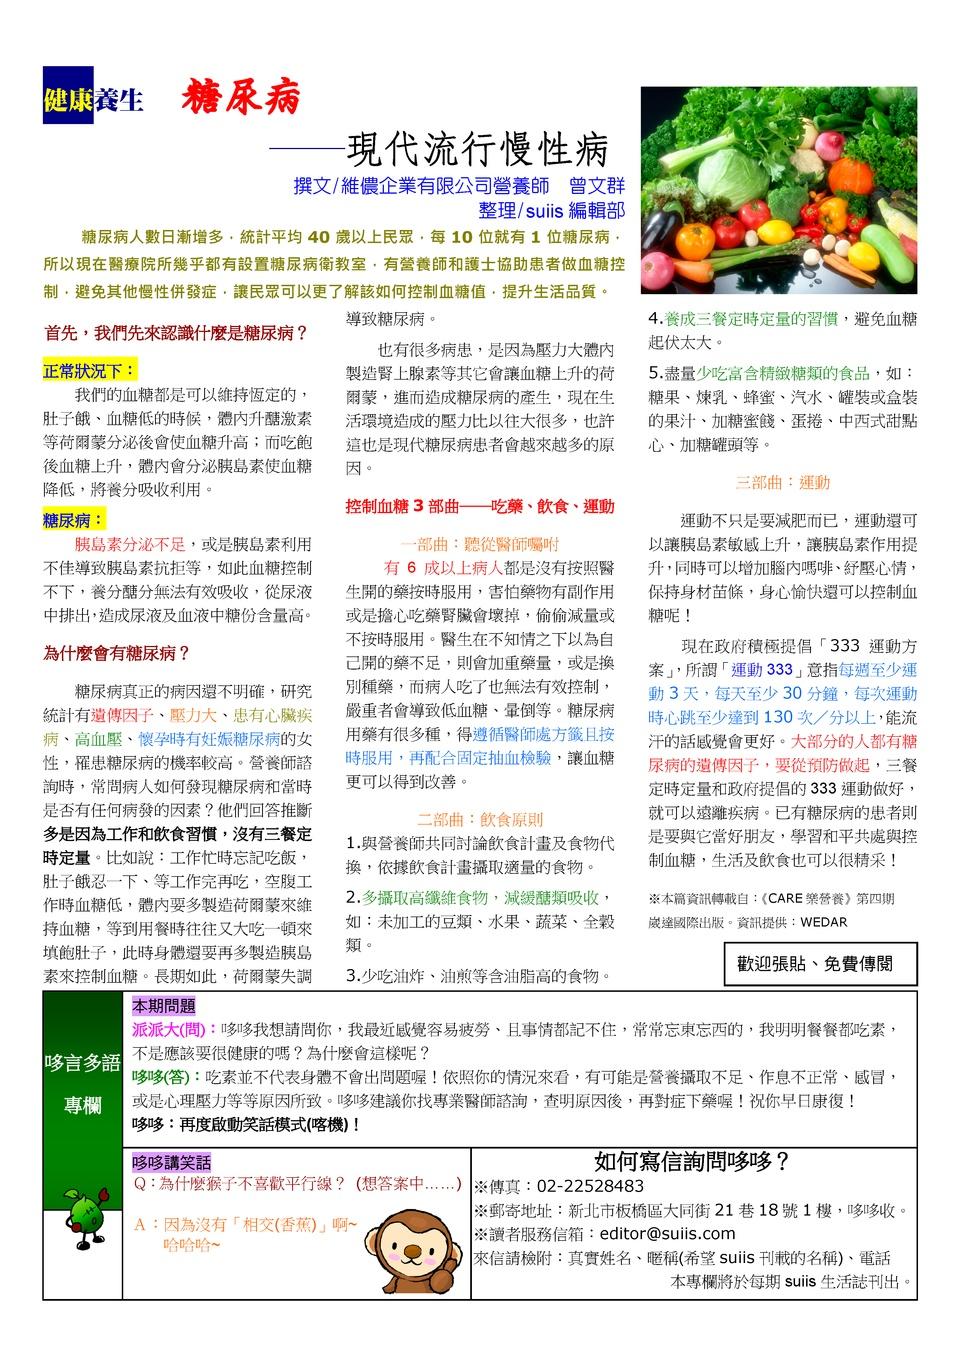 suiis 生活誌-2011-10_Page_2